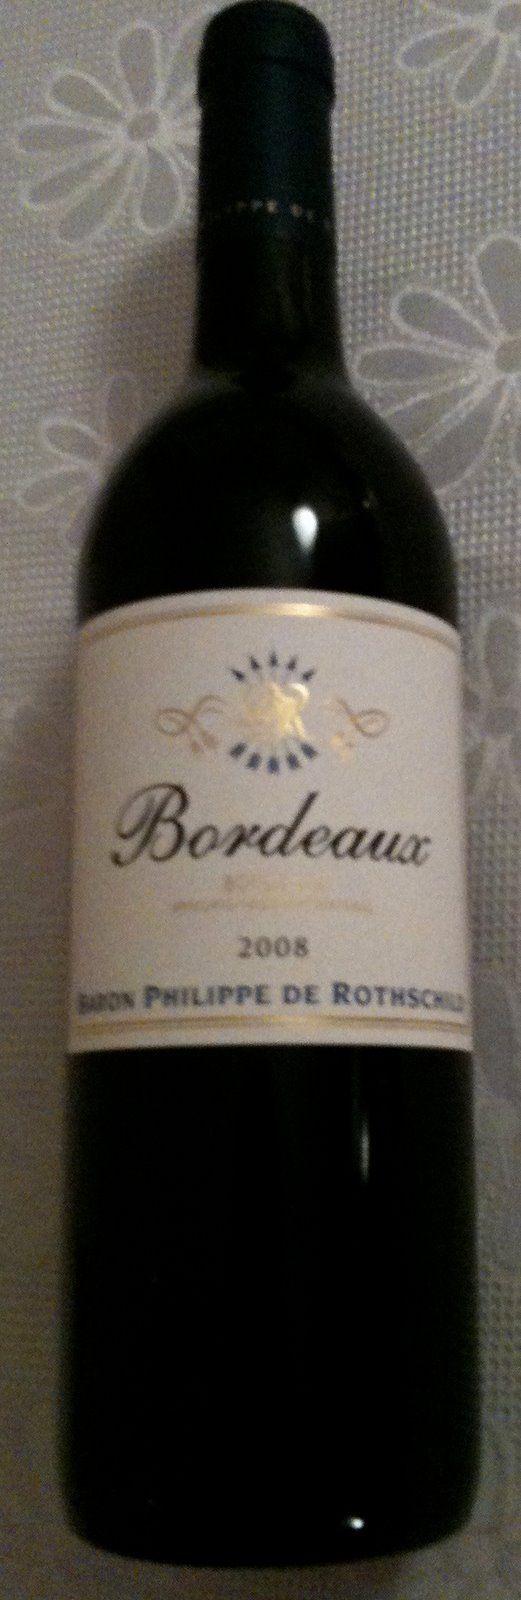 Wine Script: Baron Philippe de Rothschild Bordeaux 2008